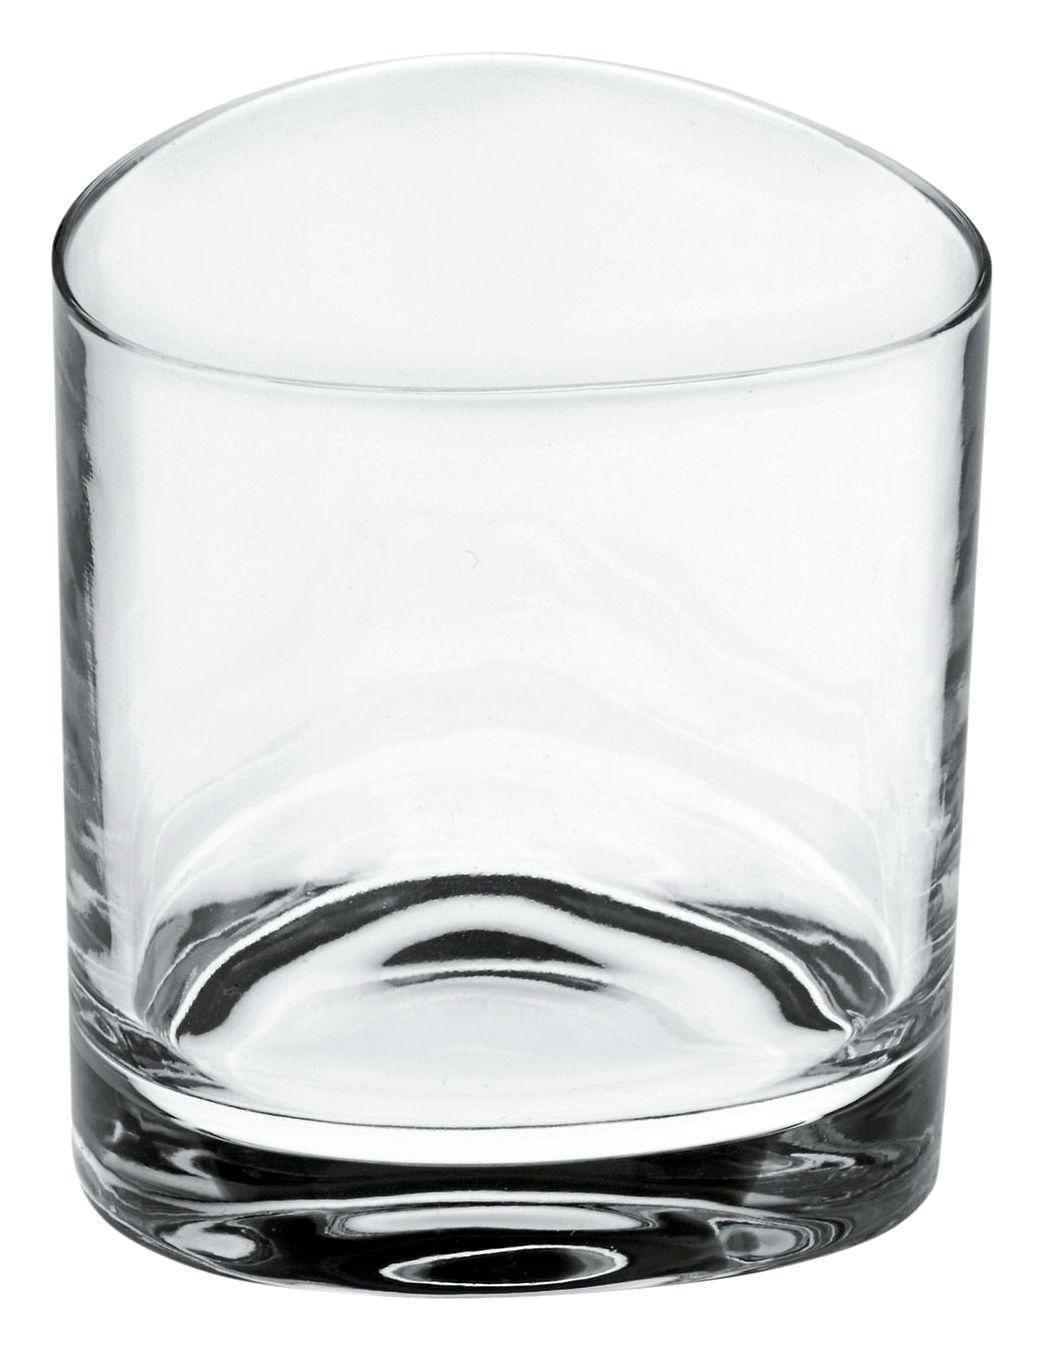 Tableware - Wine Glasses & Glassware - Colombina Wine glass by Alessi - Clear cristal - Glass